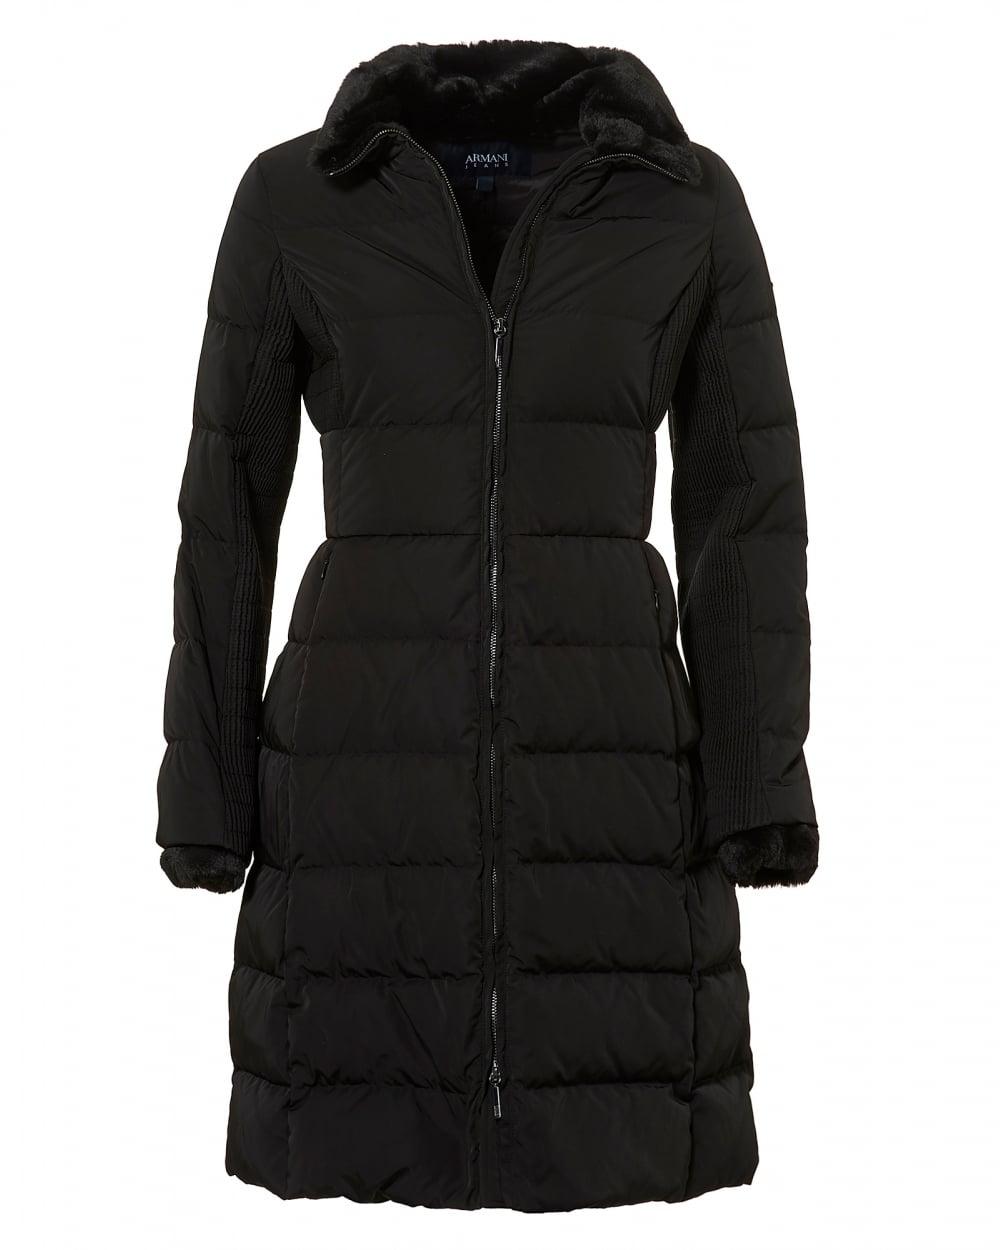 Armani Jeans Womens Long Length Jacket, Down Filled Black Puffa Coat